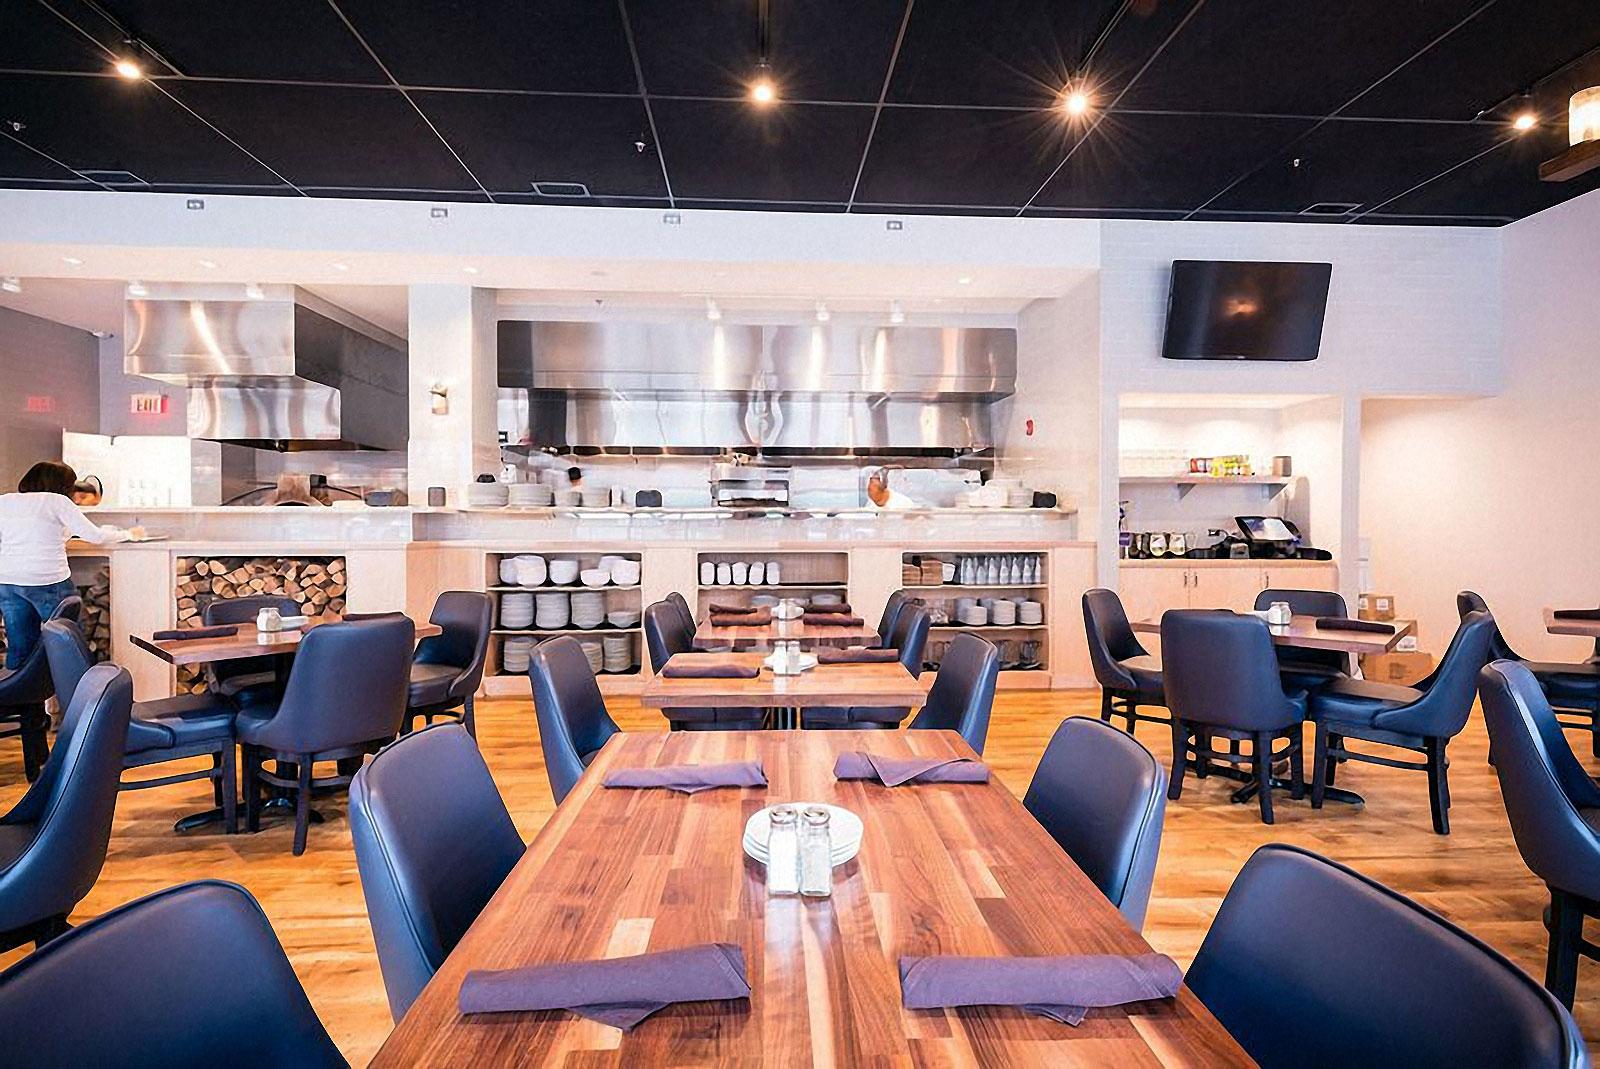 ten-mile-house-dining-interior-4